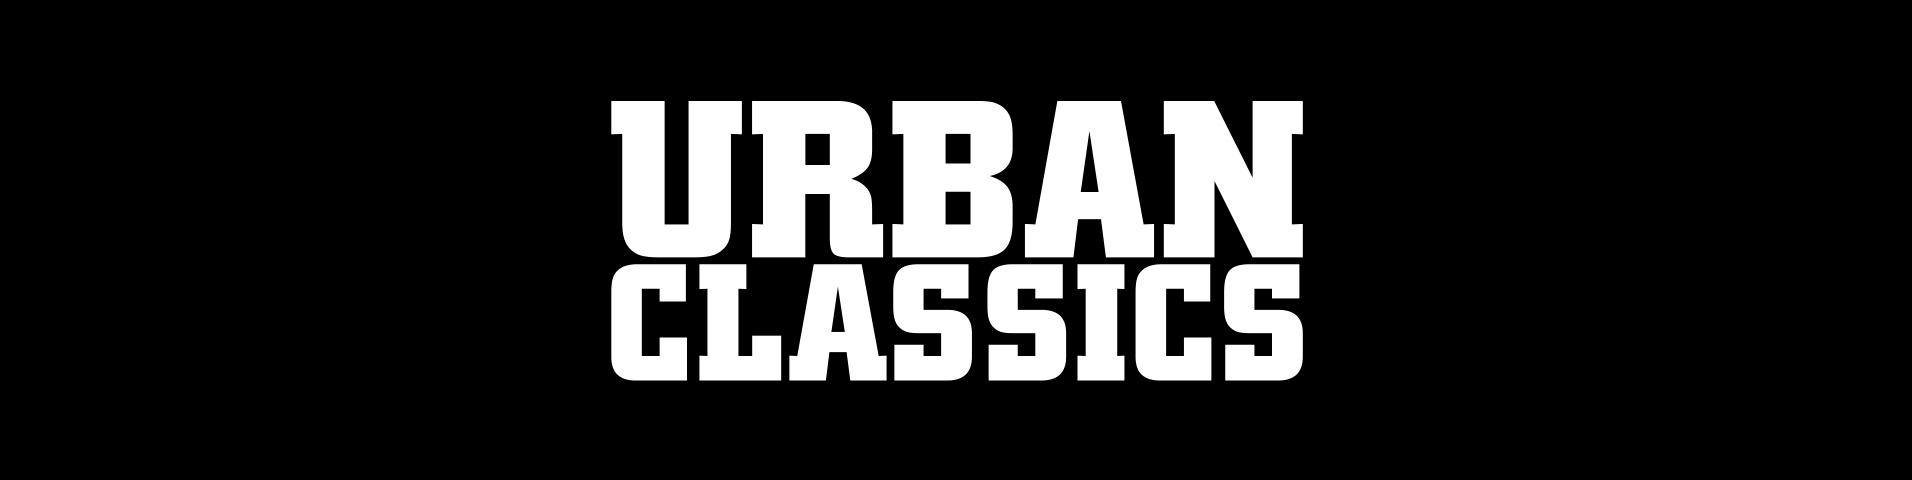 Urban Classics Acheter Urban Classics En Ligne Sur Zalando